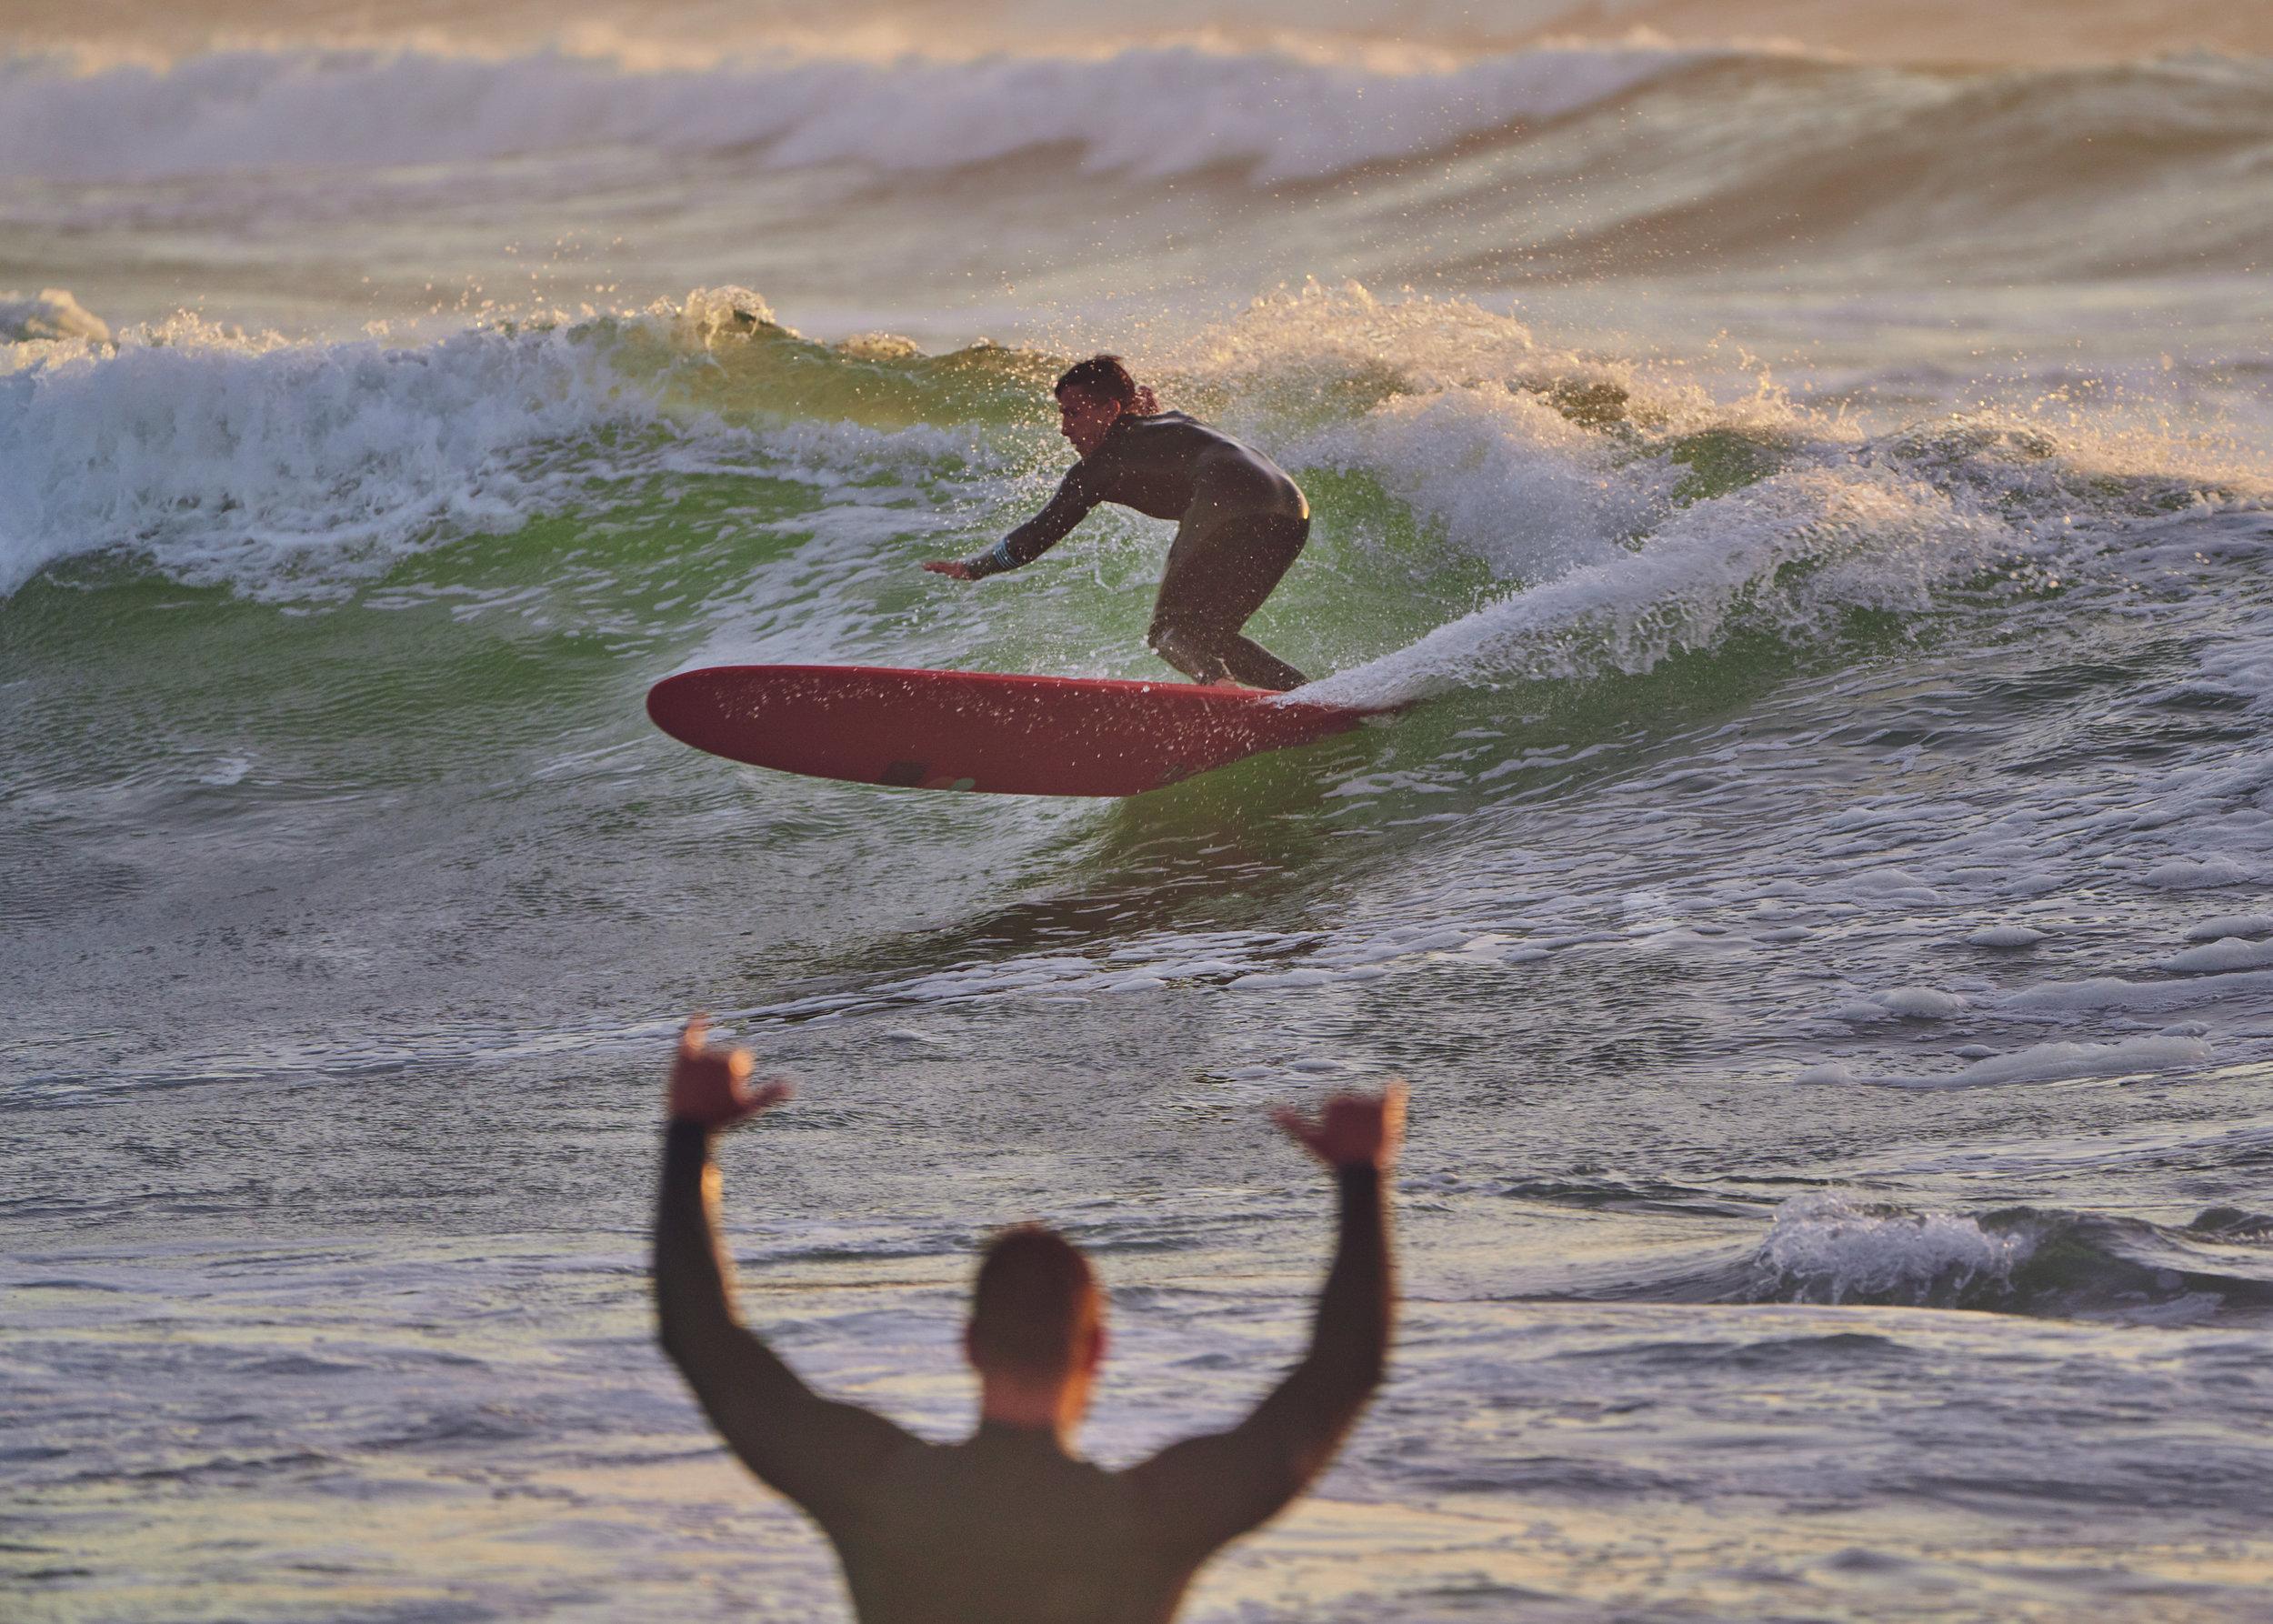 Nolan-Dubeau-Sony-Kando-Surfing-DSC08720.jpg